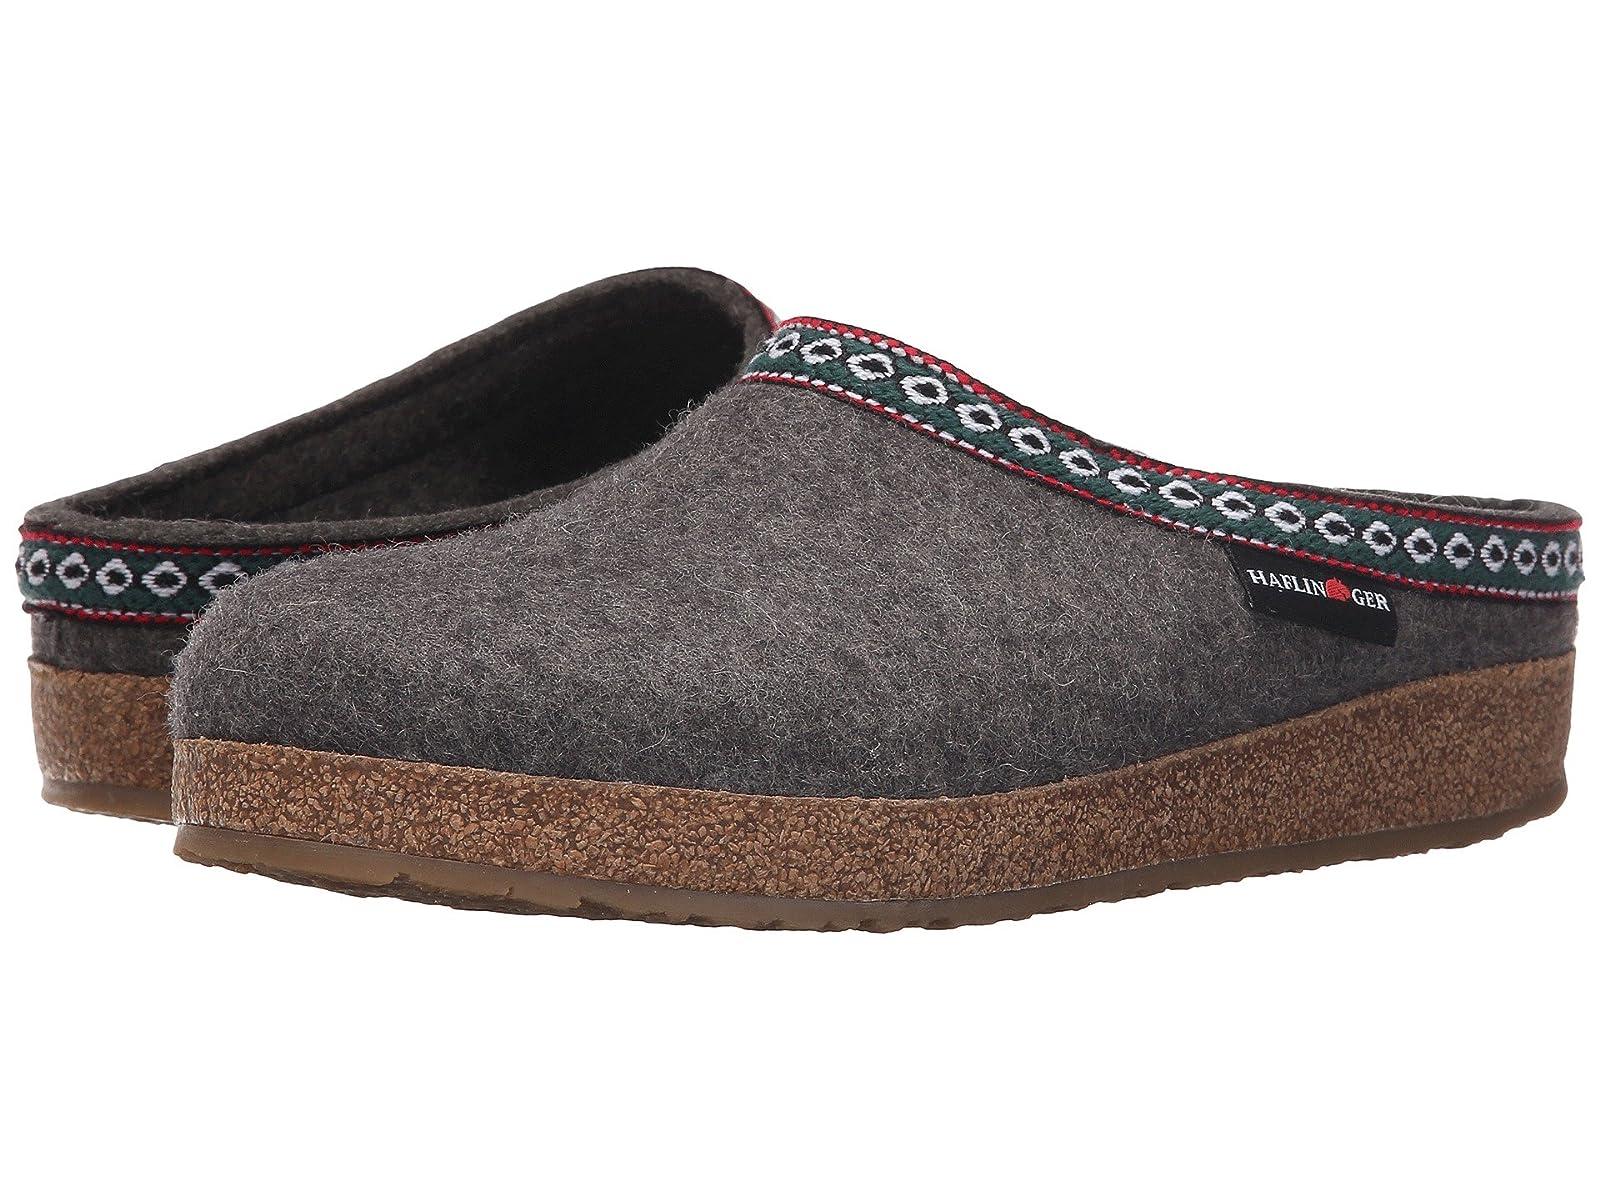 Haflinger GZ Classic GrizzlyAtmospheric grades have affordable shoes